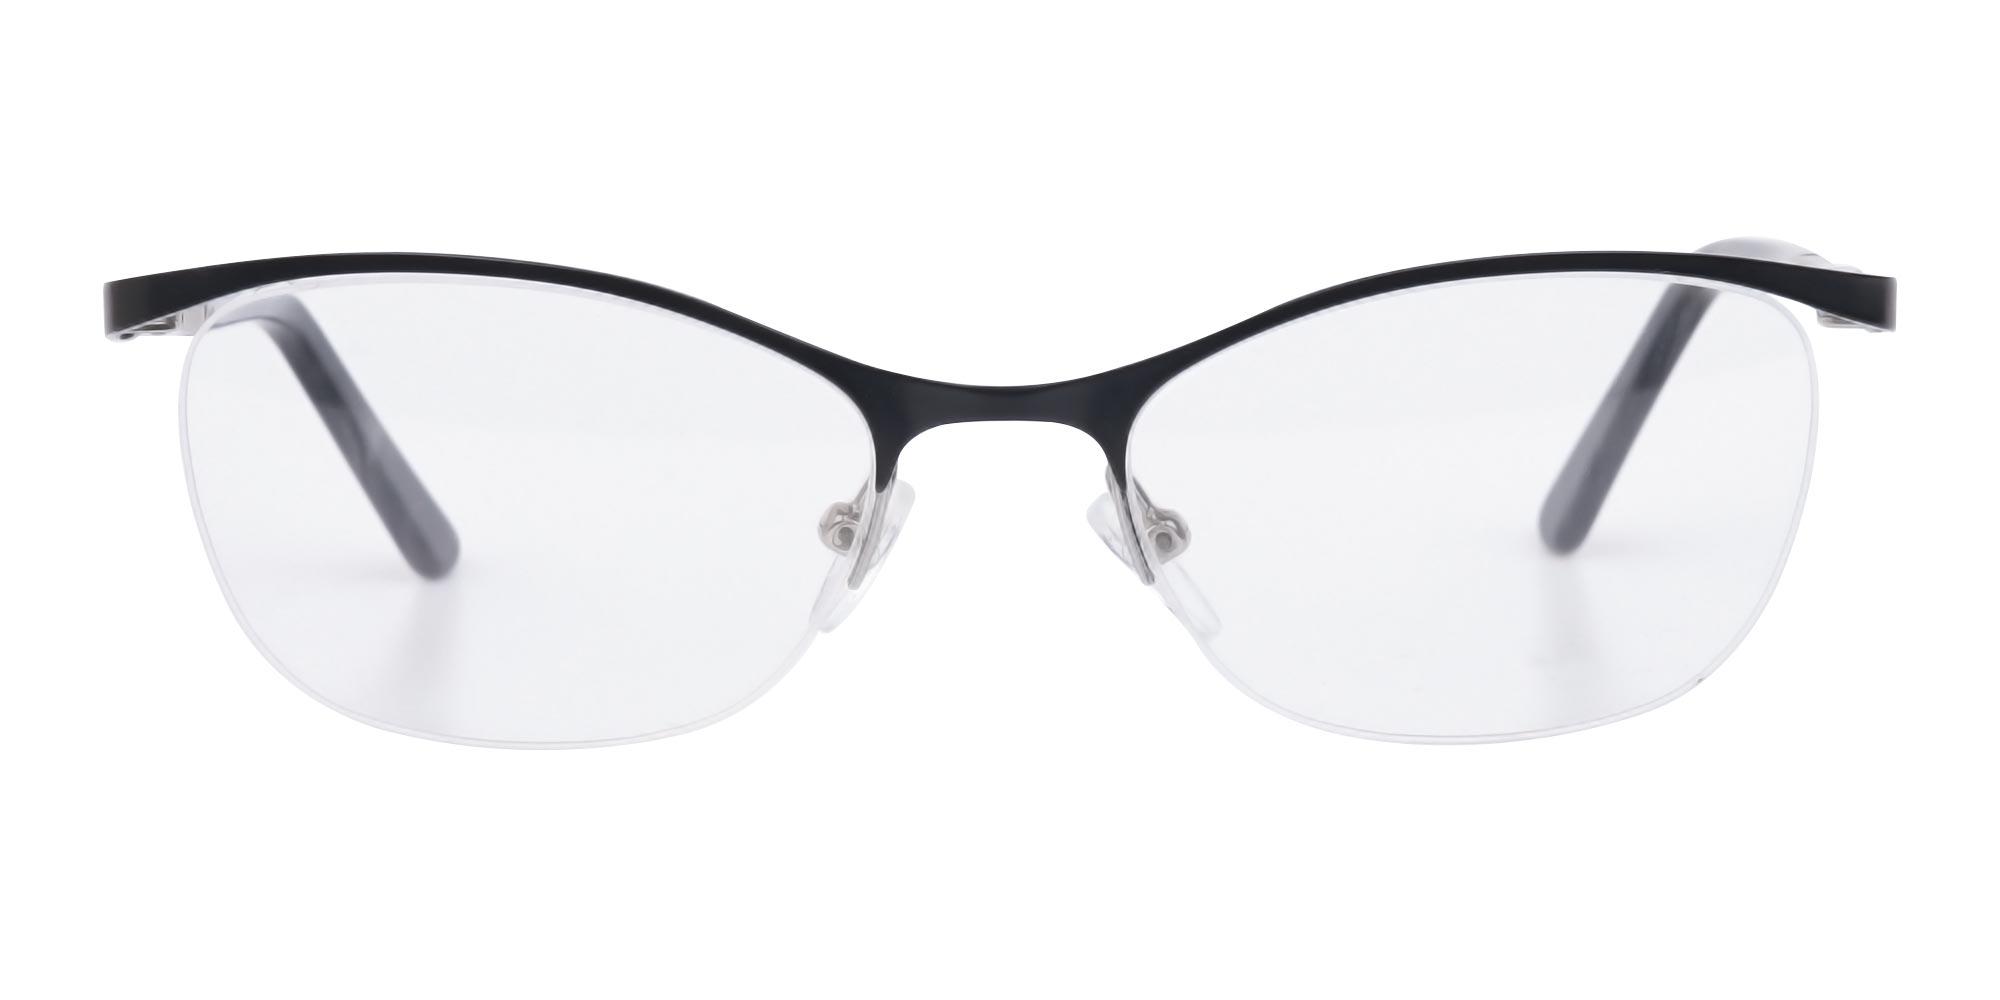 Oval cat eyeglasses in Matte Black